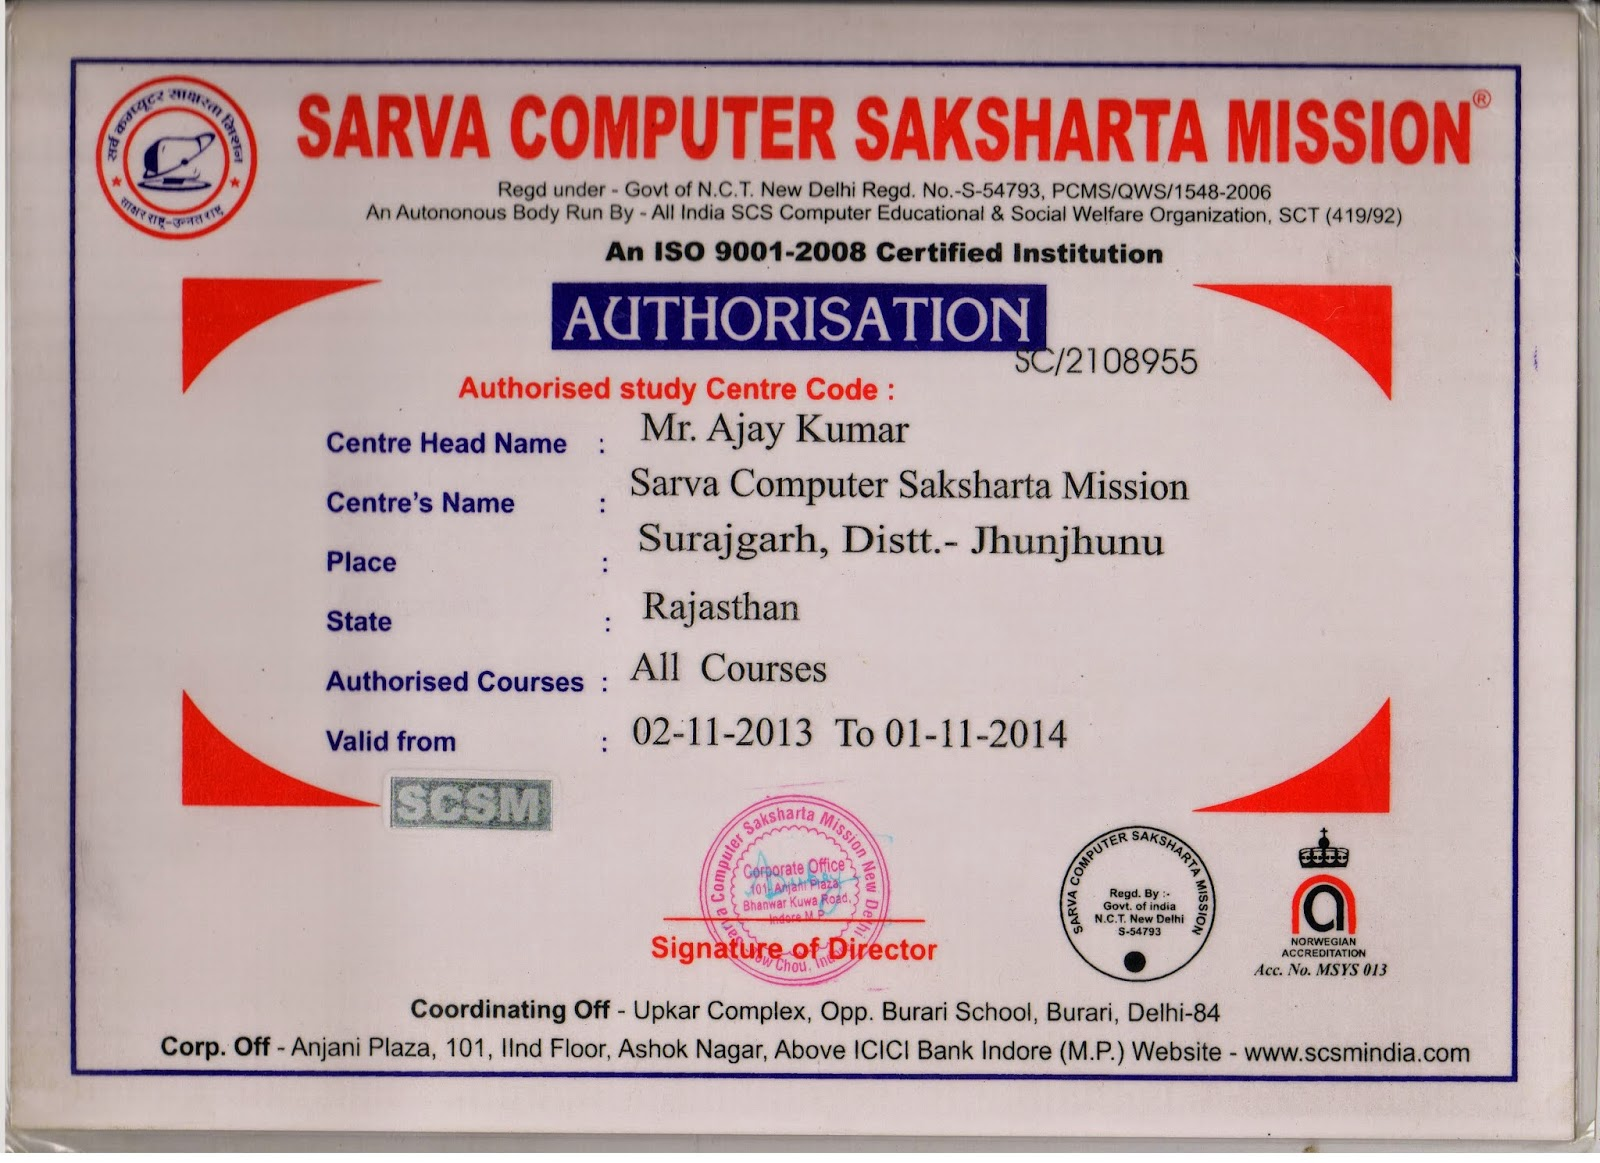 Sarva computer saksharta mission authorisation certificate xflitez Gallery